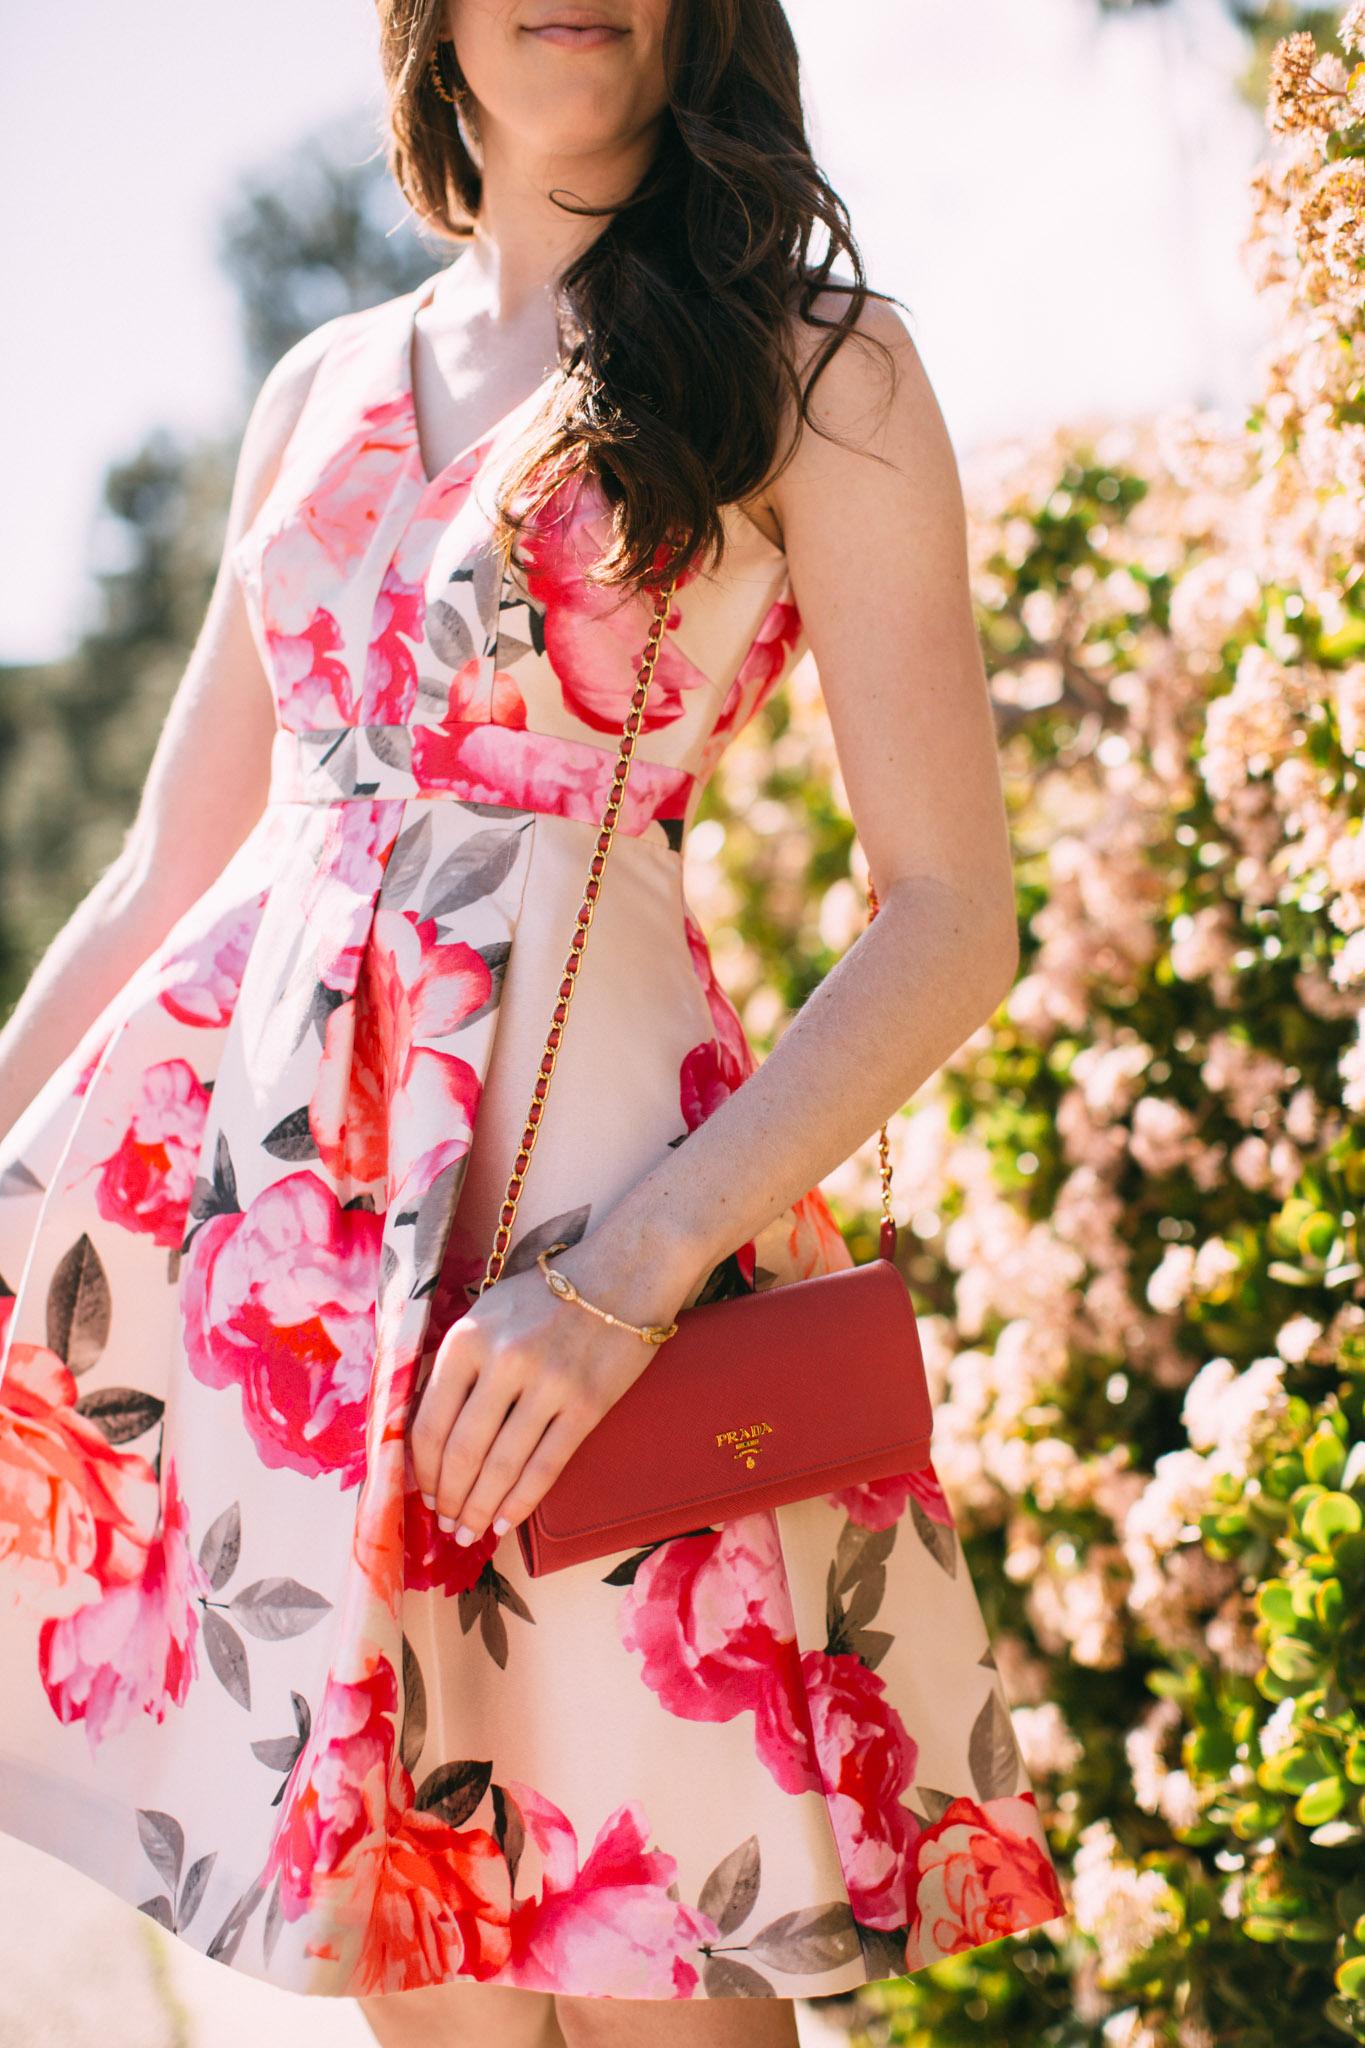 Small pink Prada purse